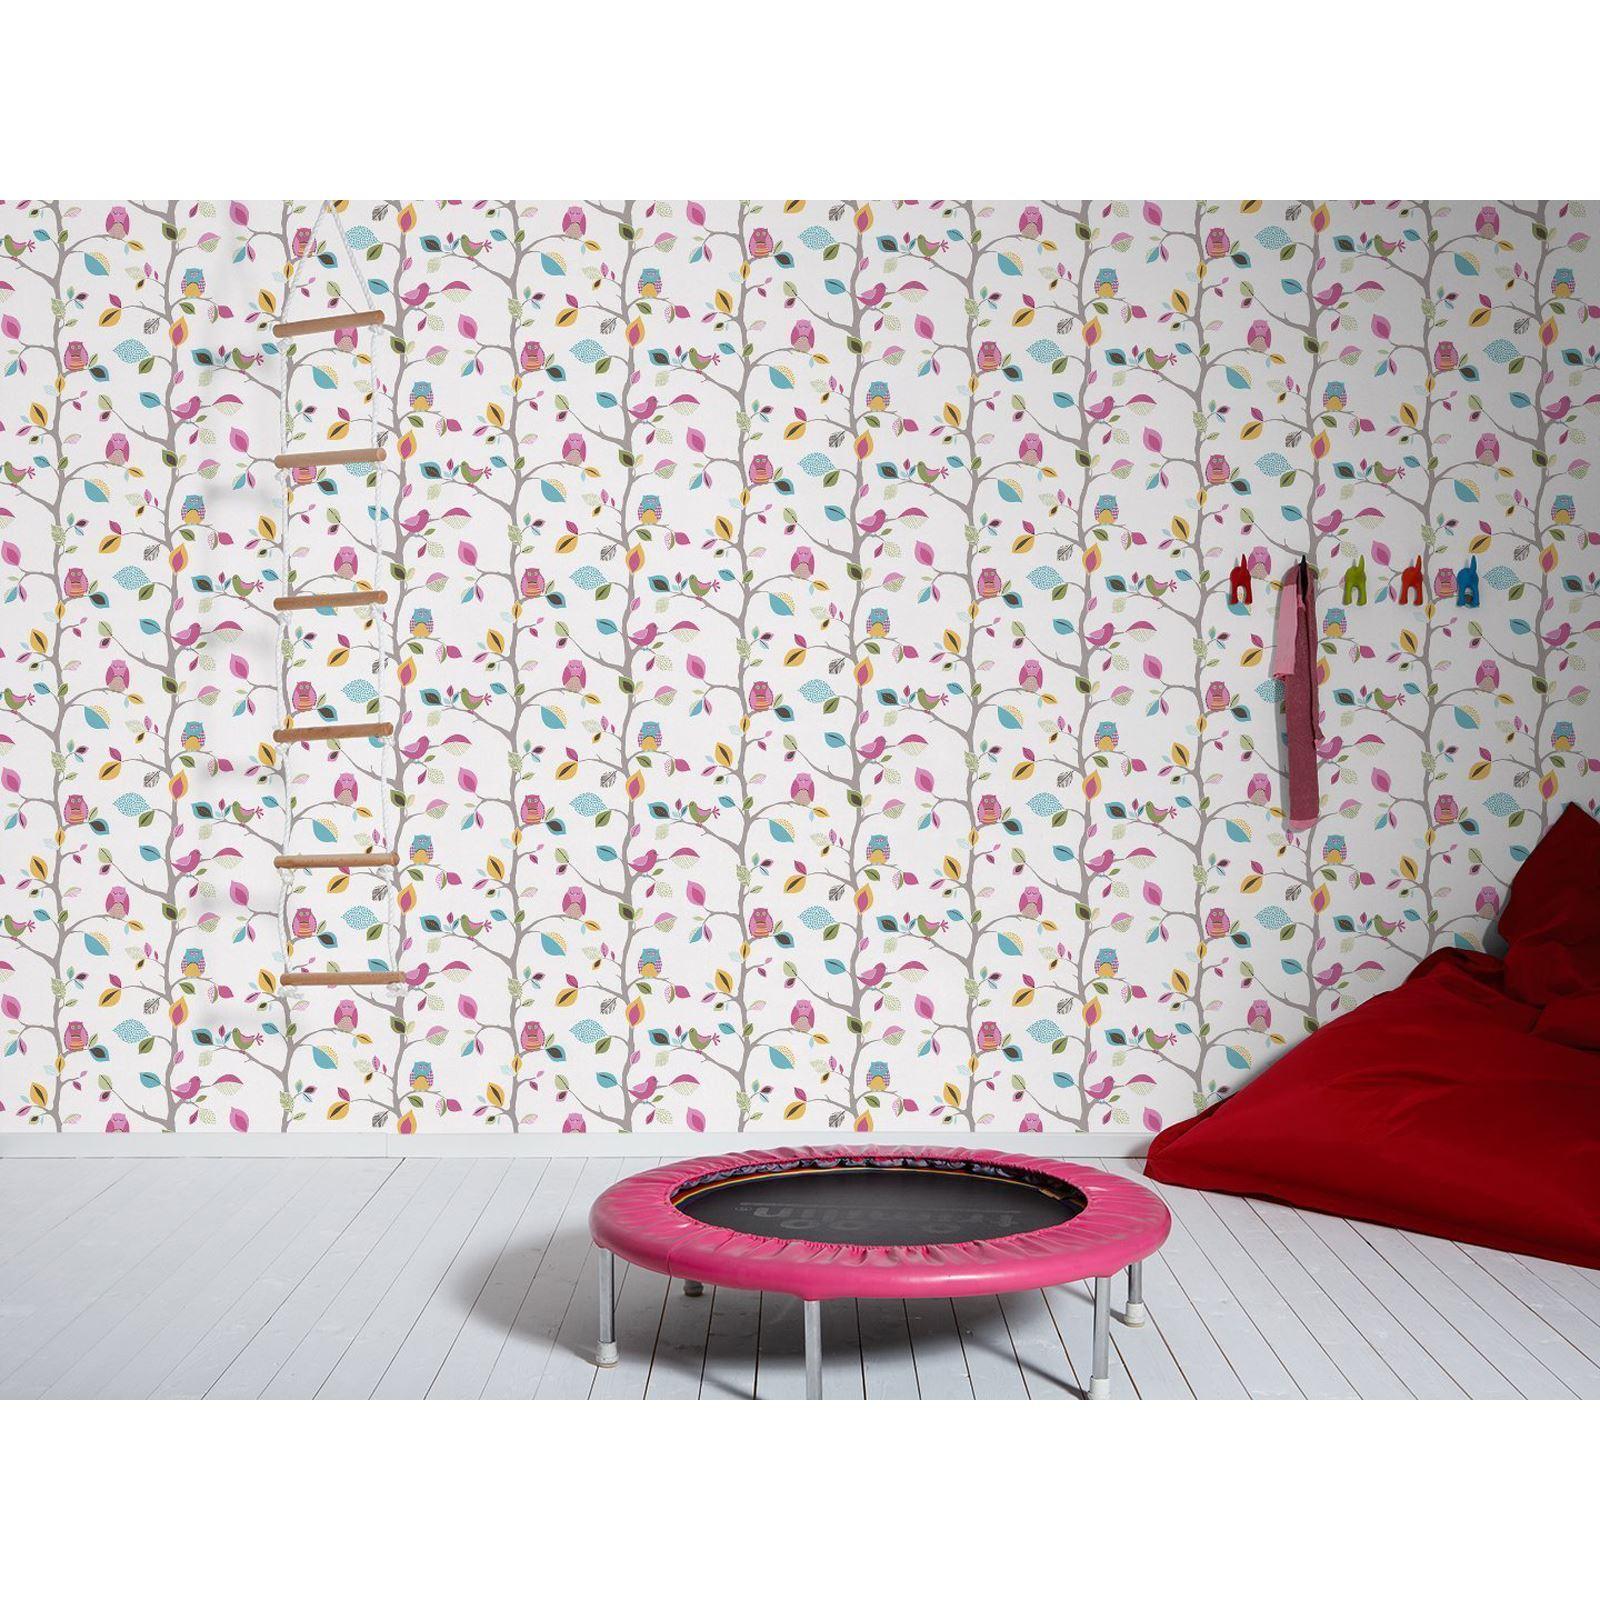 GIRLS CHIC WALLPAPER KIDS BEDROOM FEATURE WALL DECOR VARIOUS DESIGNS